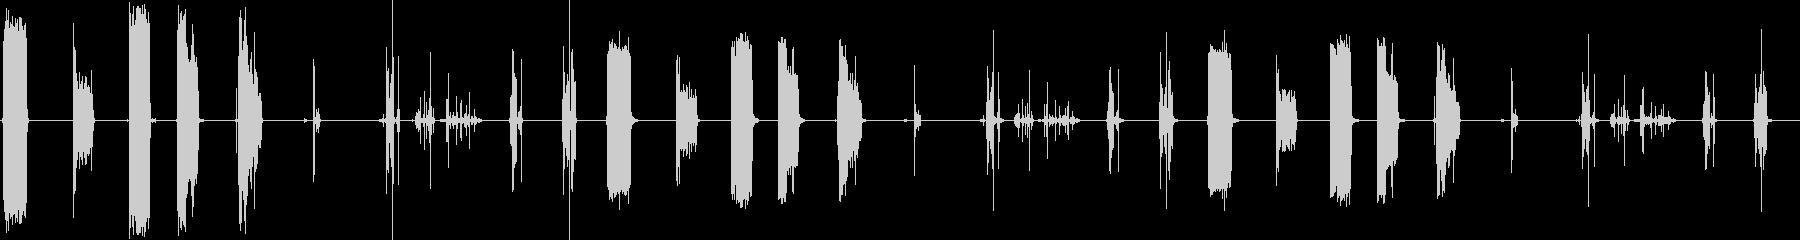 RIPS-ペーパー-9バージョンX...の未再生の波形